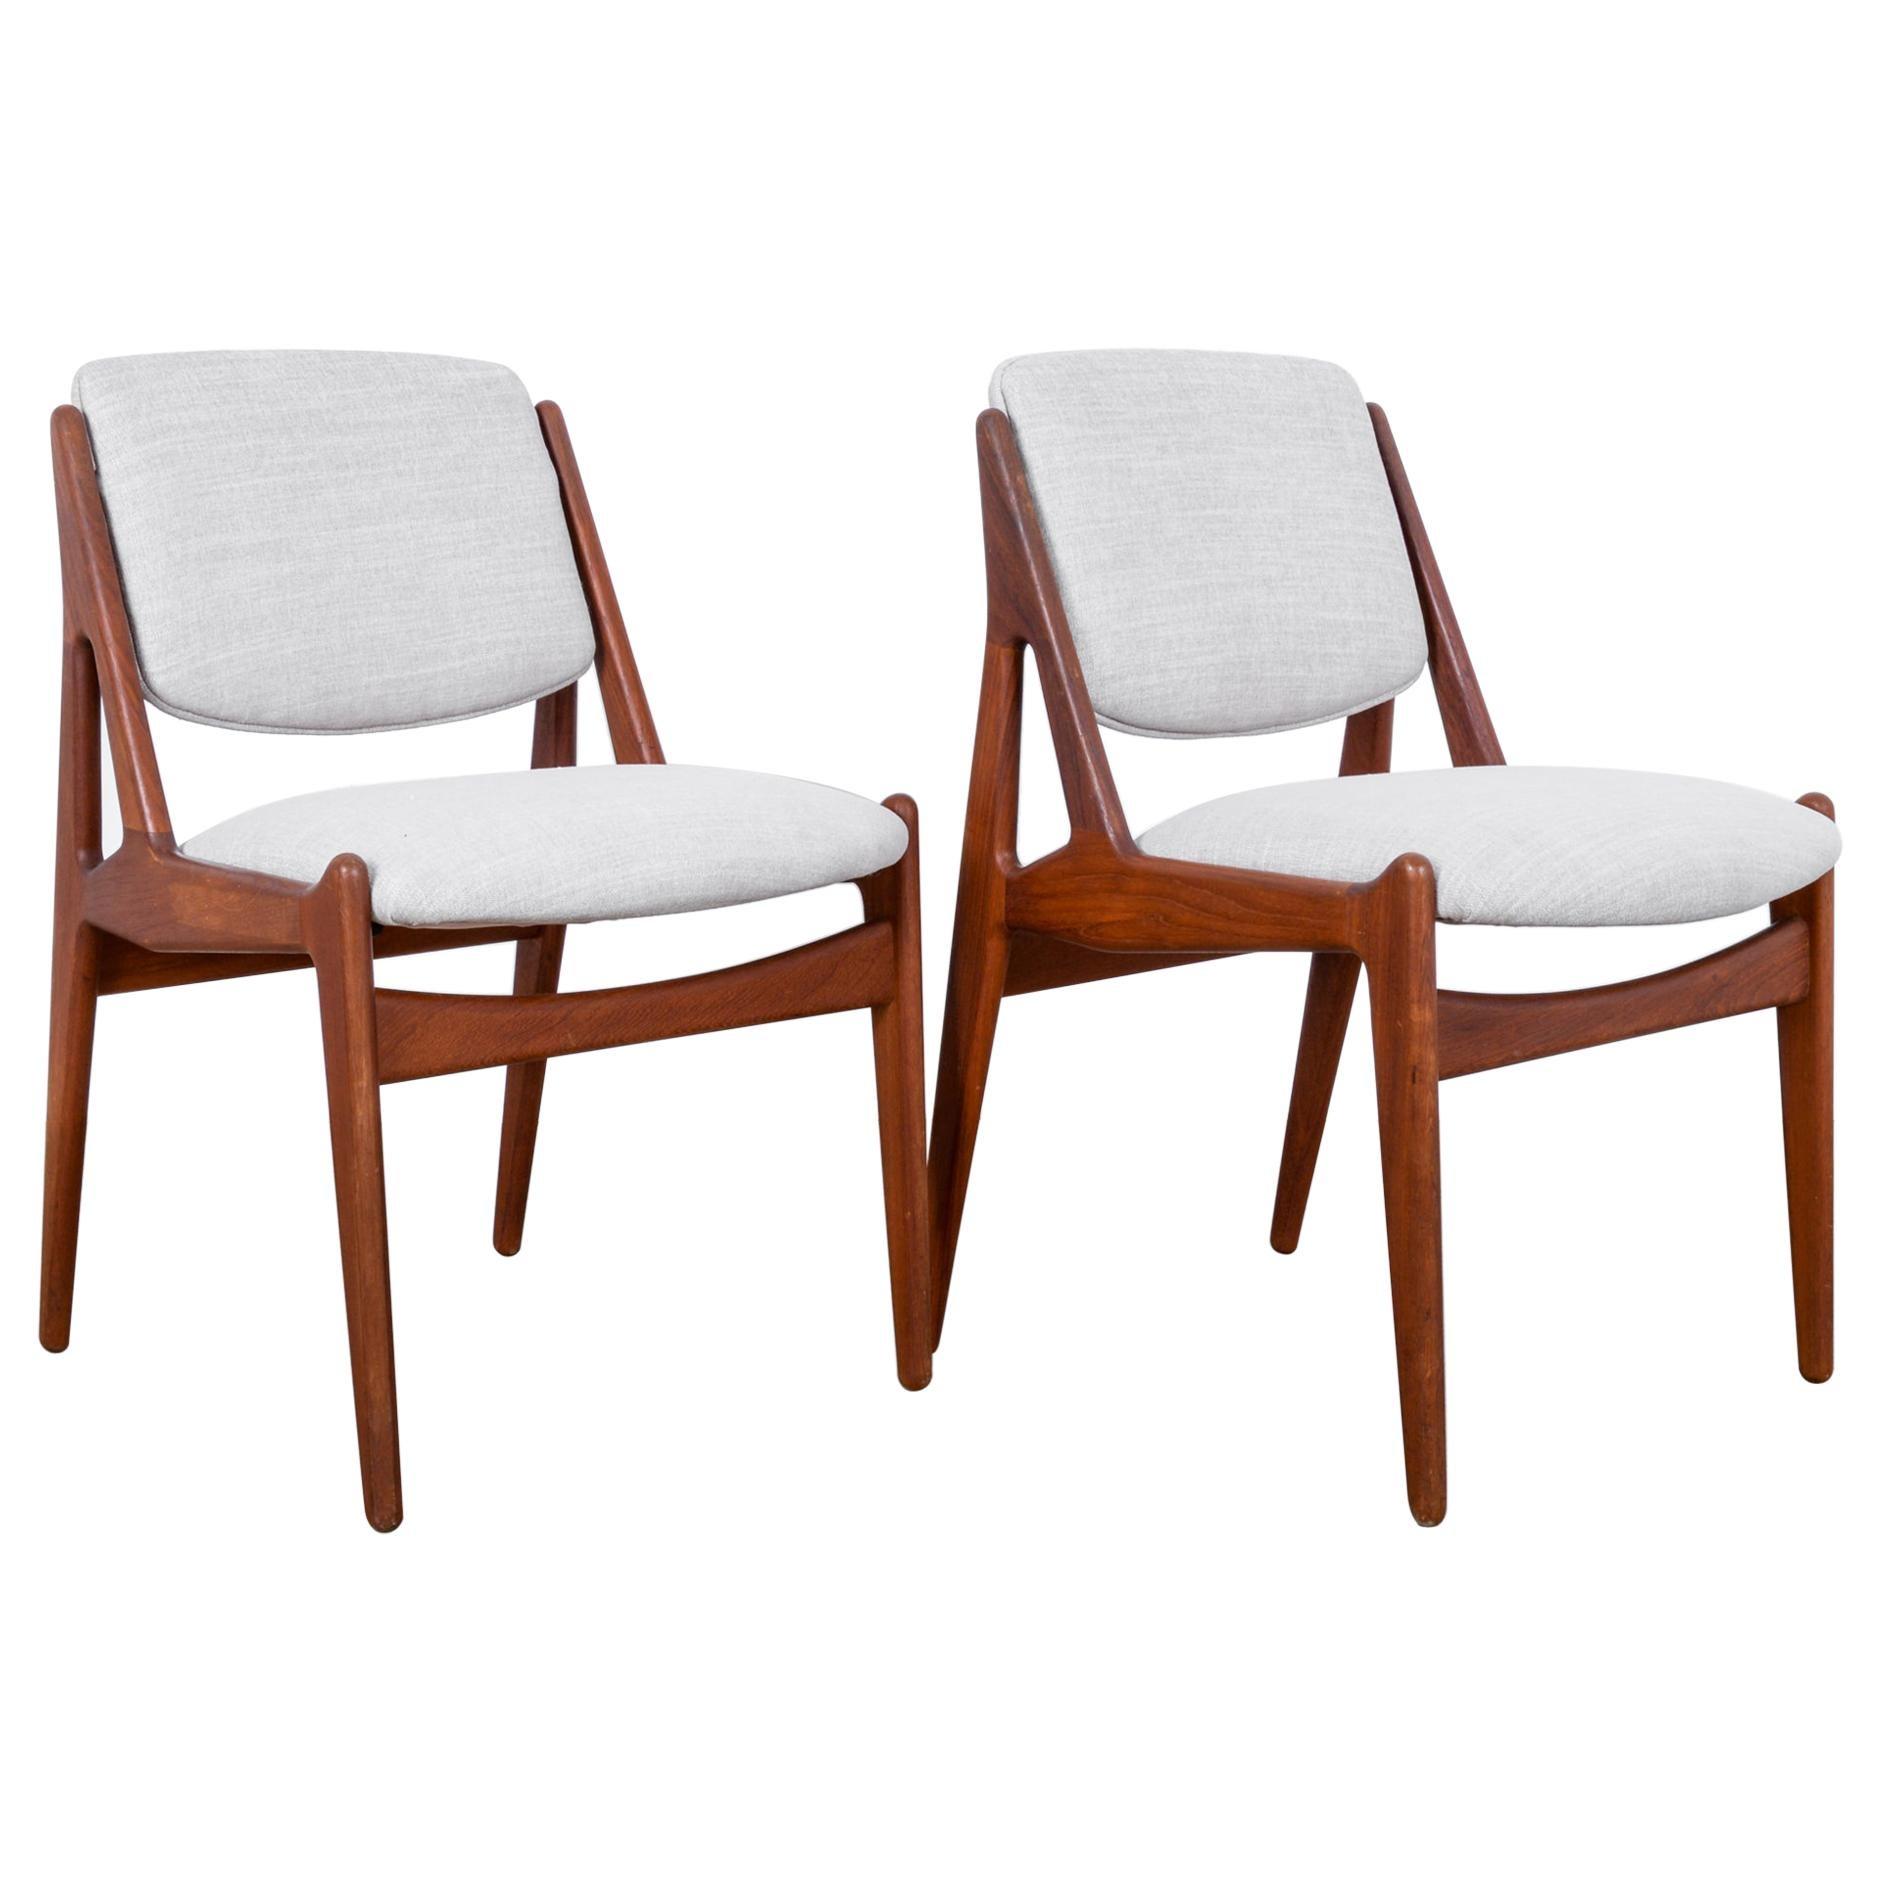 Arne Vodder Upholstered Teak Side Chairs, a Pair